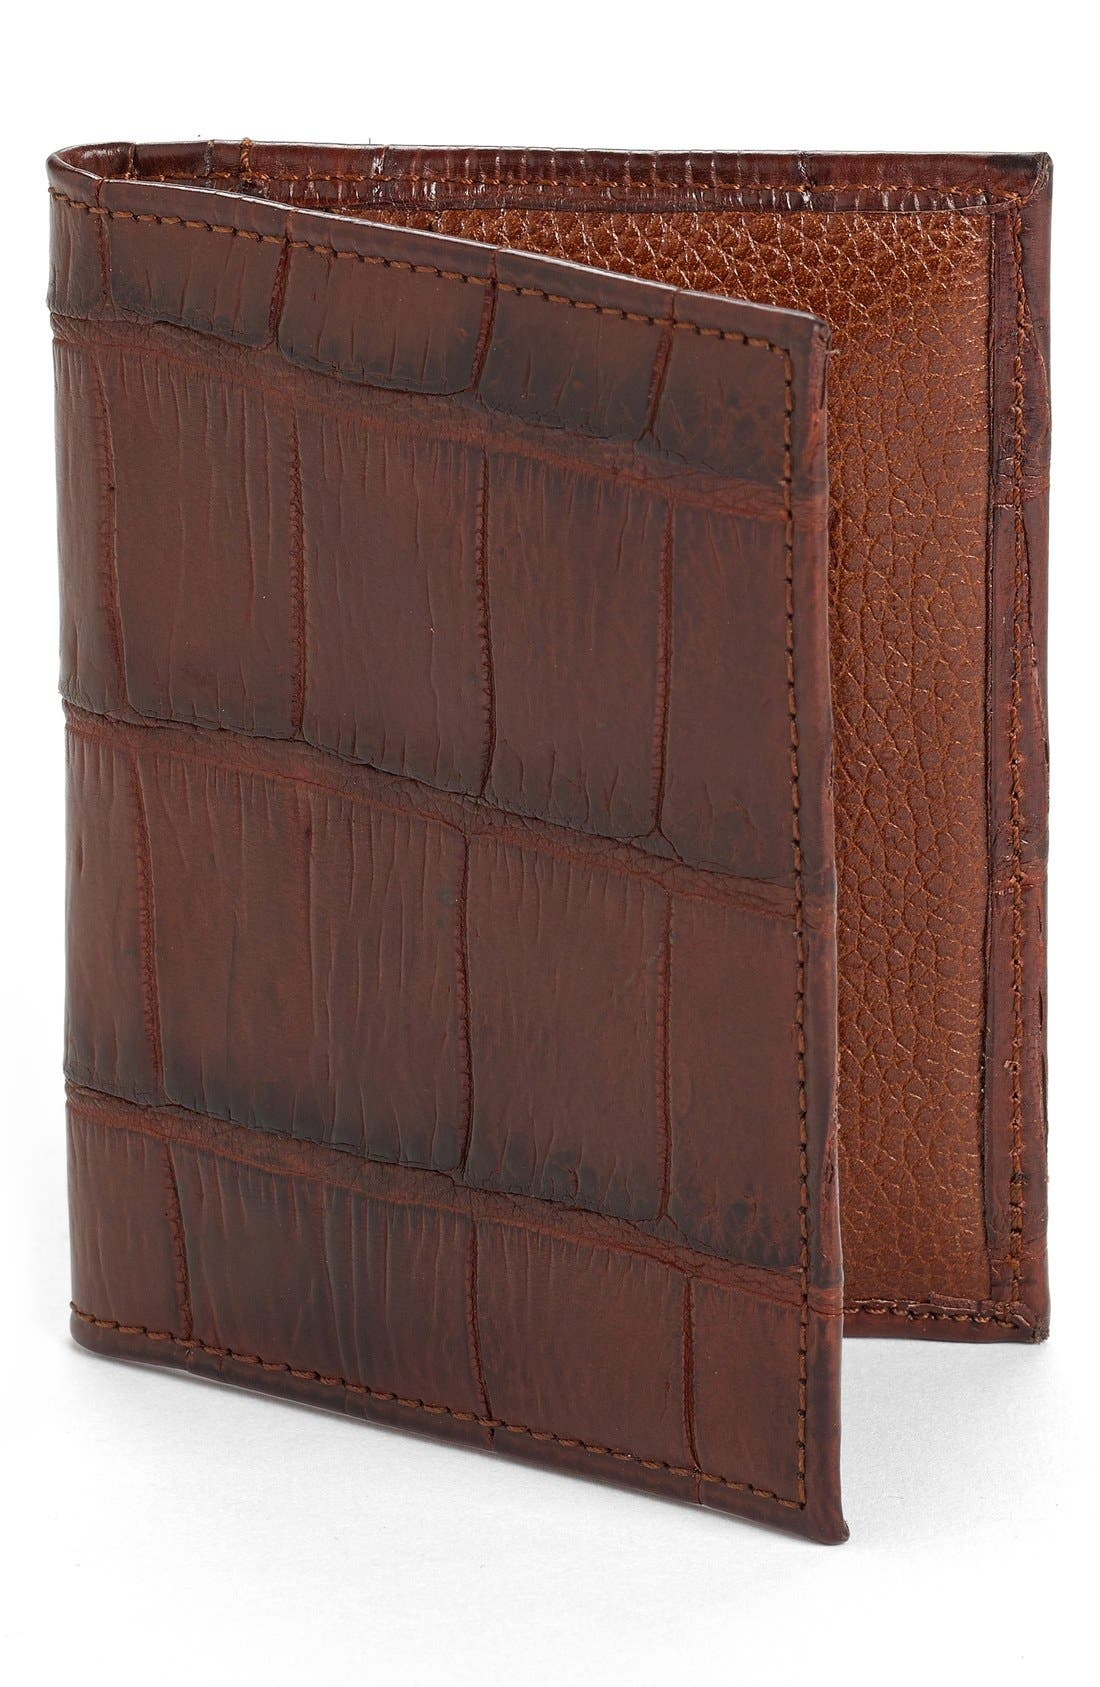 Martin Dingman Jameson Matte Finish Genuine Alligator Leather Wallet